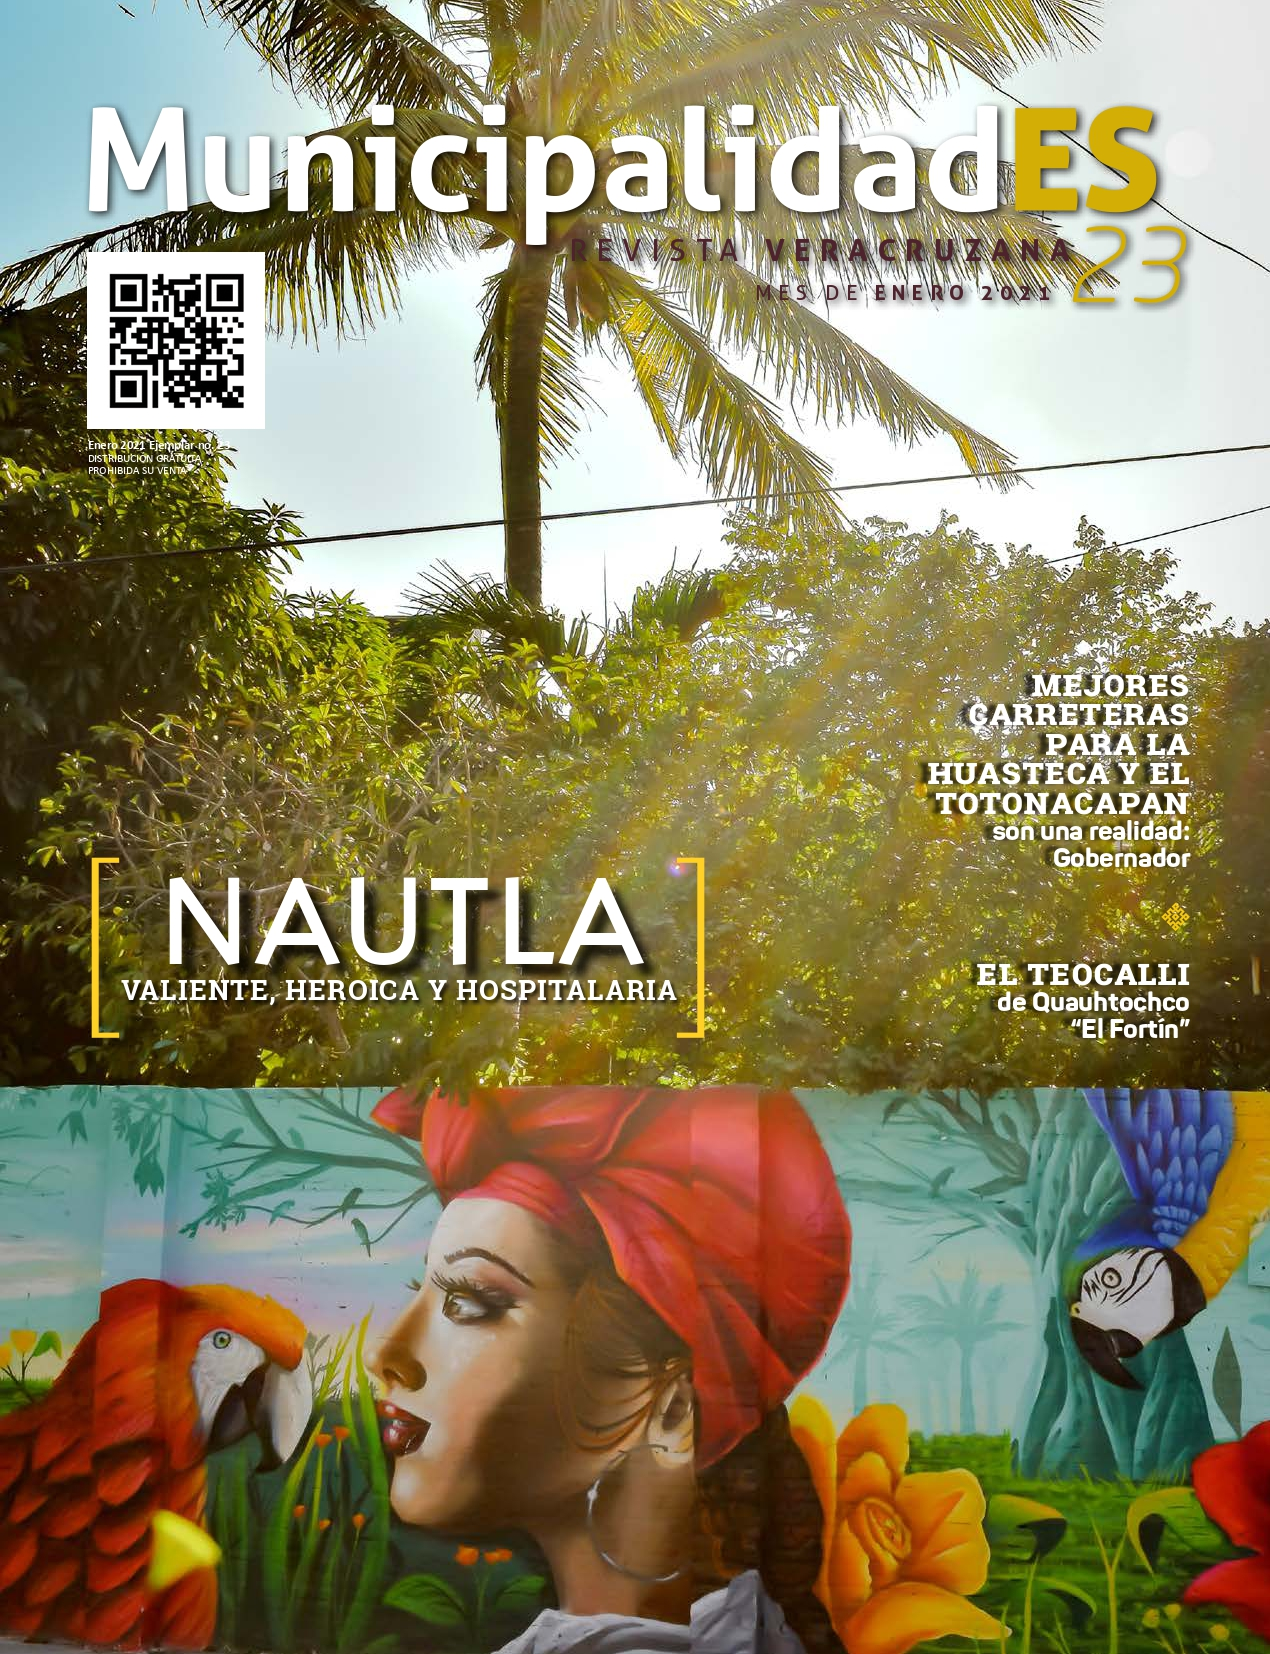 Revista MunicipalidadES #23_page-0001